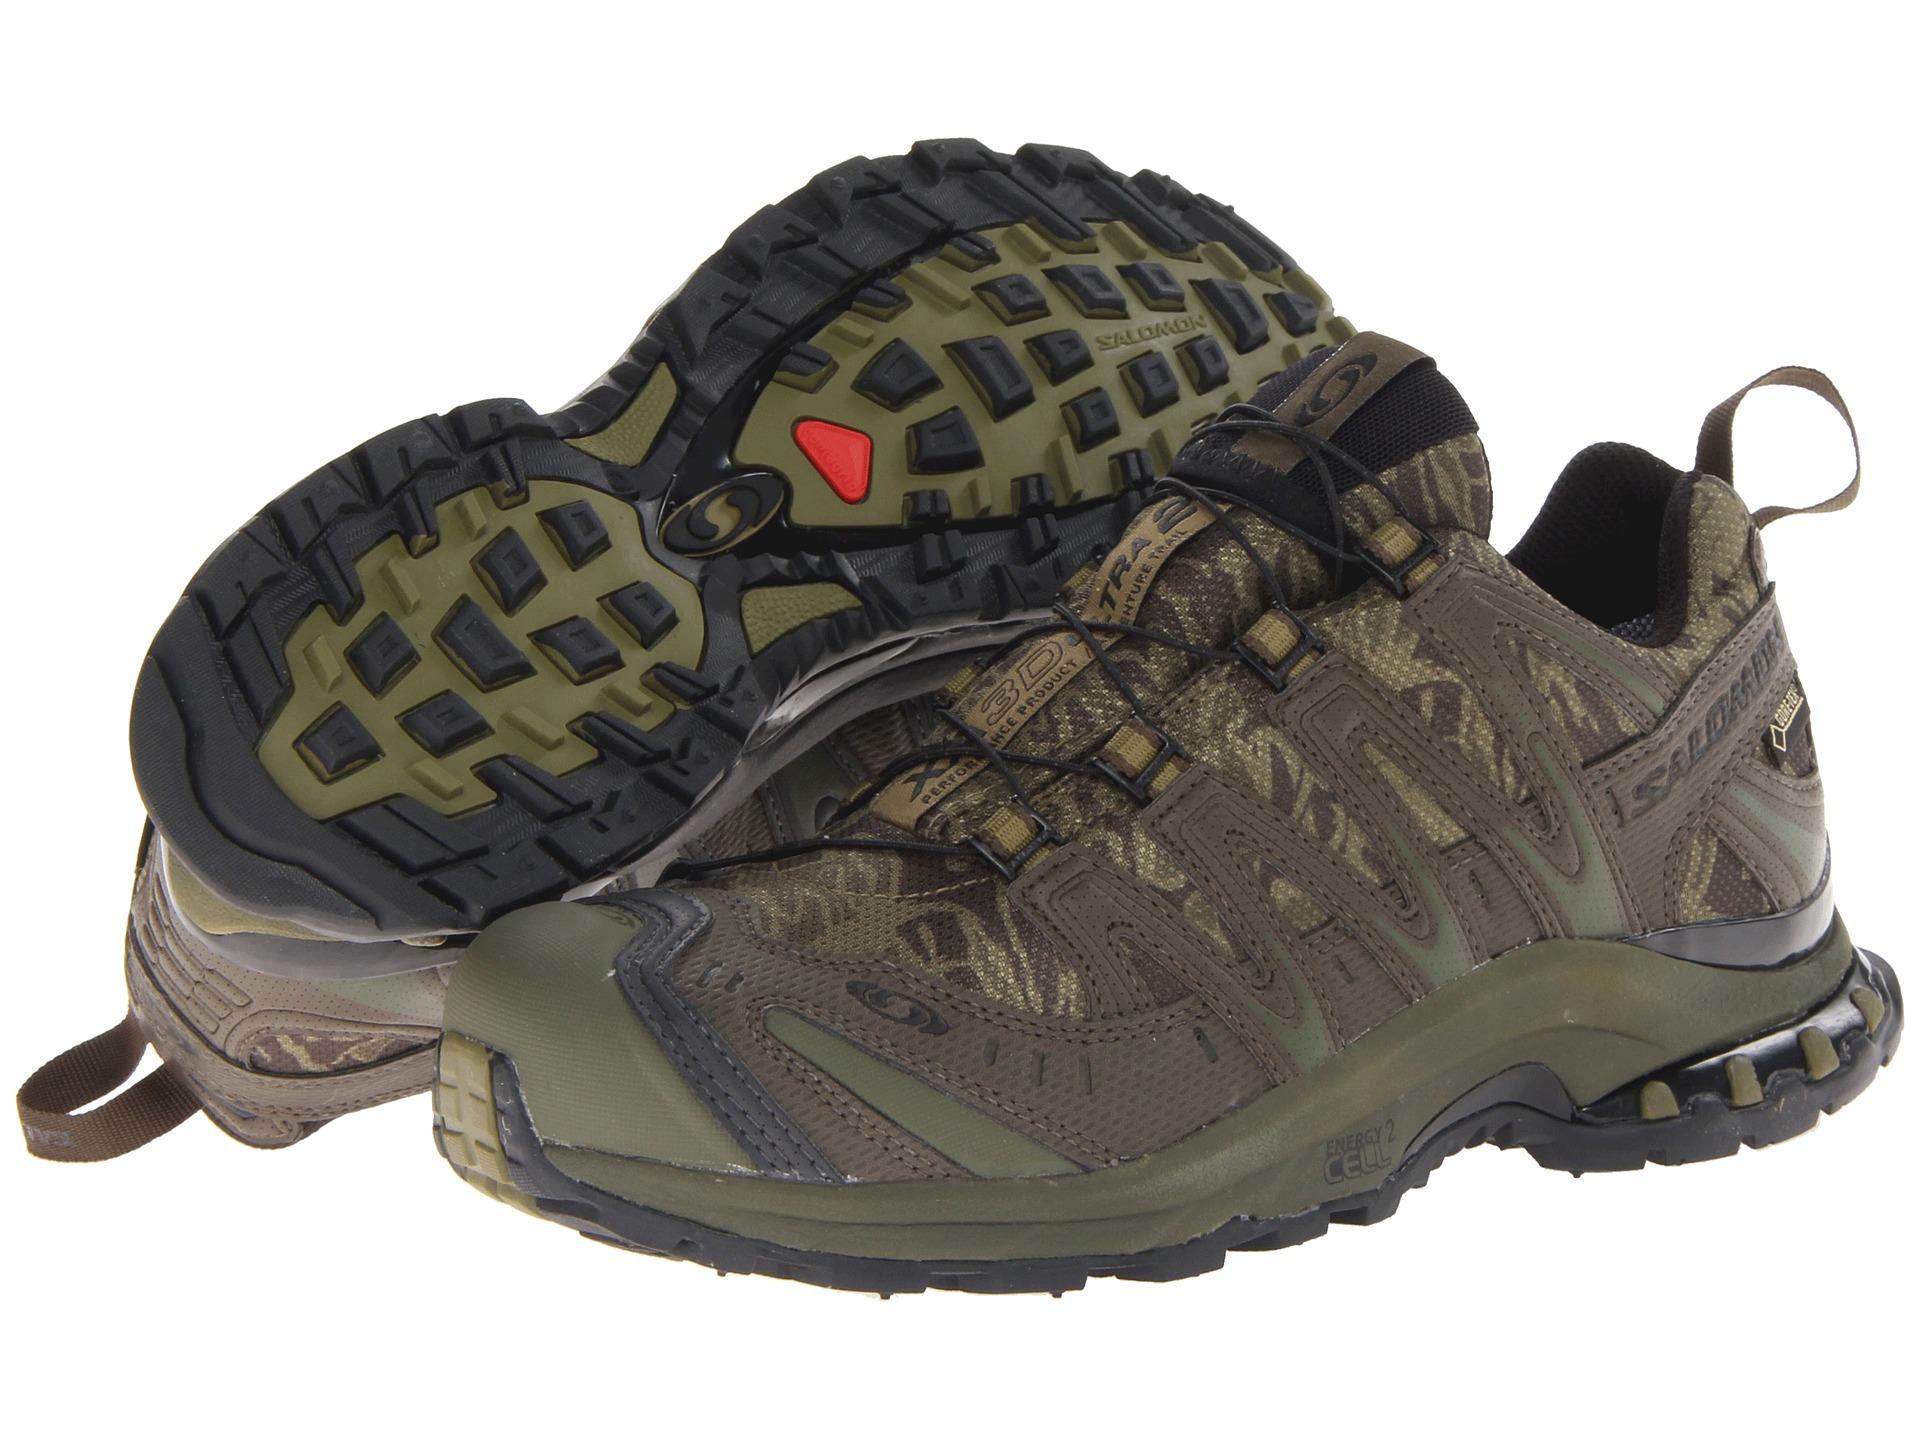 Xa Pro 3d Ultra Shoe 2 Gtx-Salomon